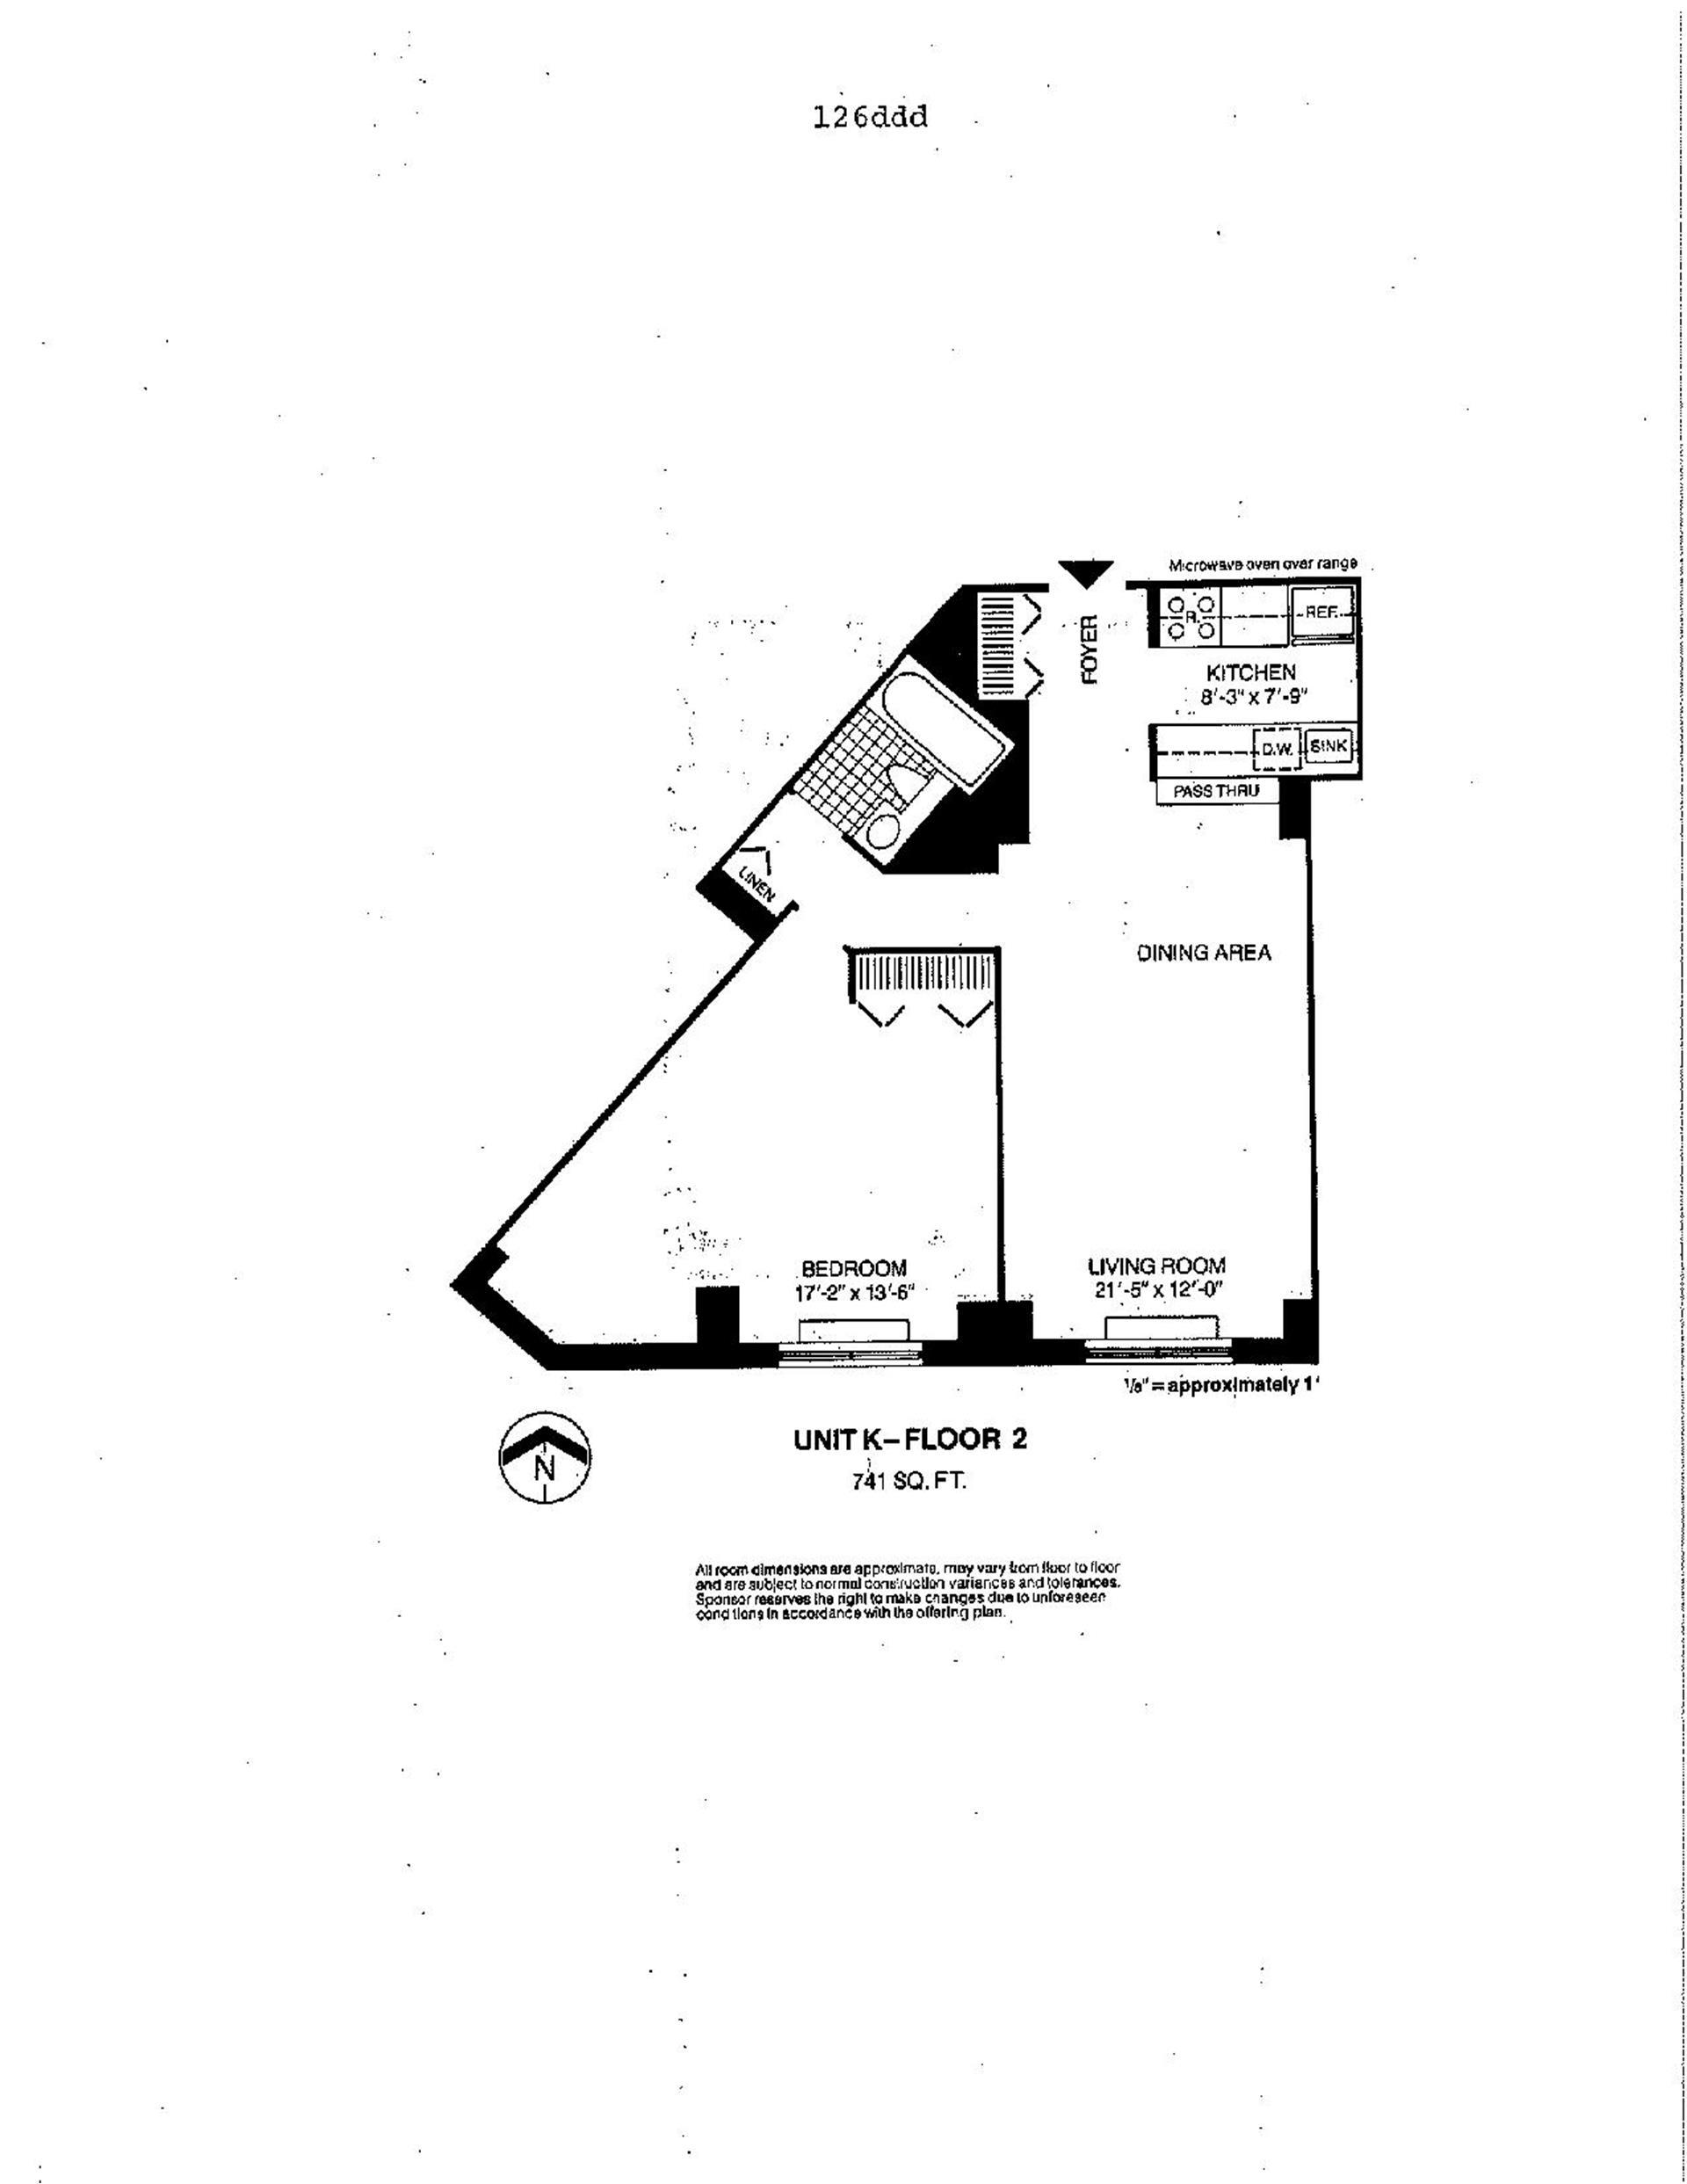 Floor plan of Liberty Residences, 377 Rector Pl, 2K - Battery Park City, New York